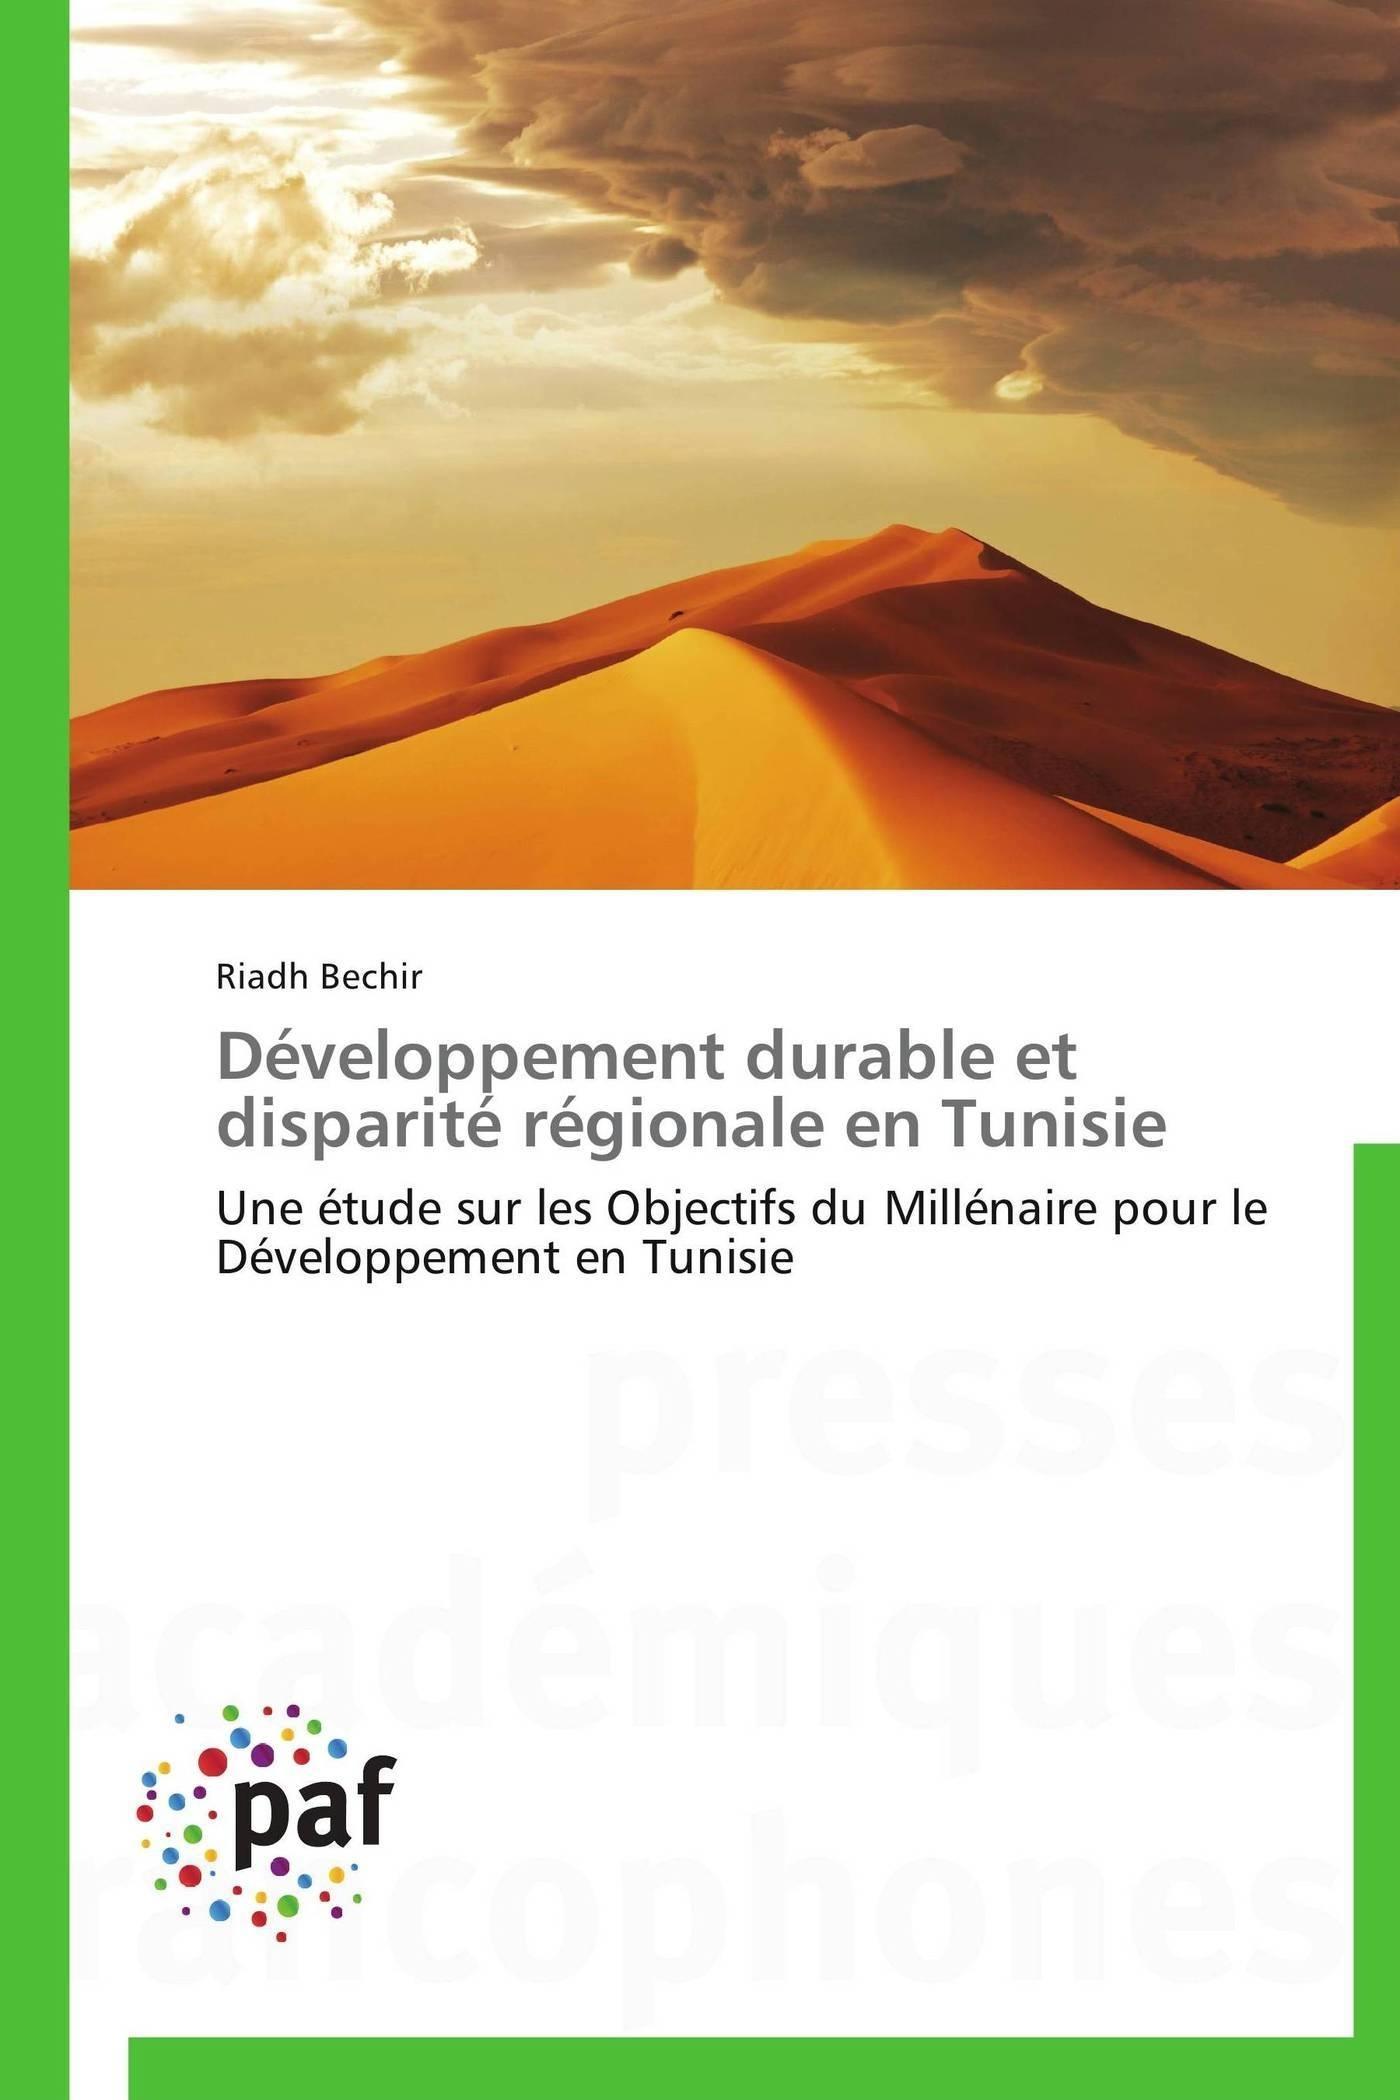 DEVELOPPEMENT DURABLE ET DISPARITE REGIONALE EN TUNISIE